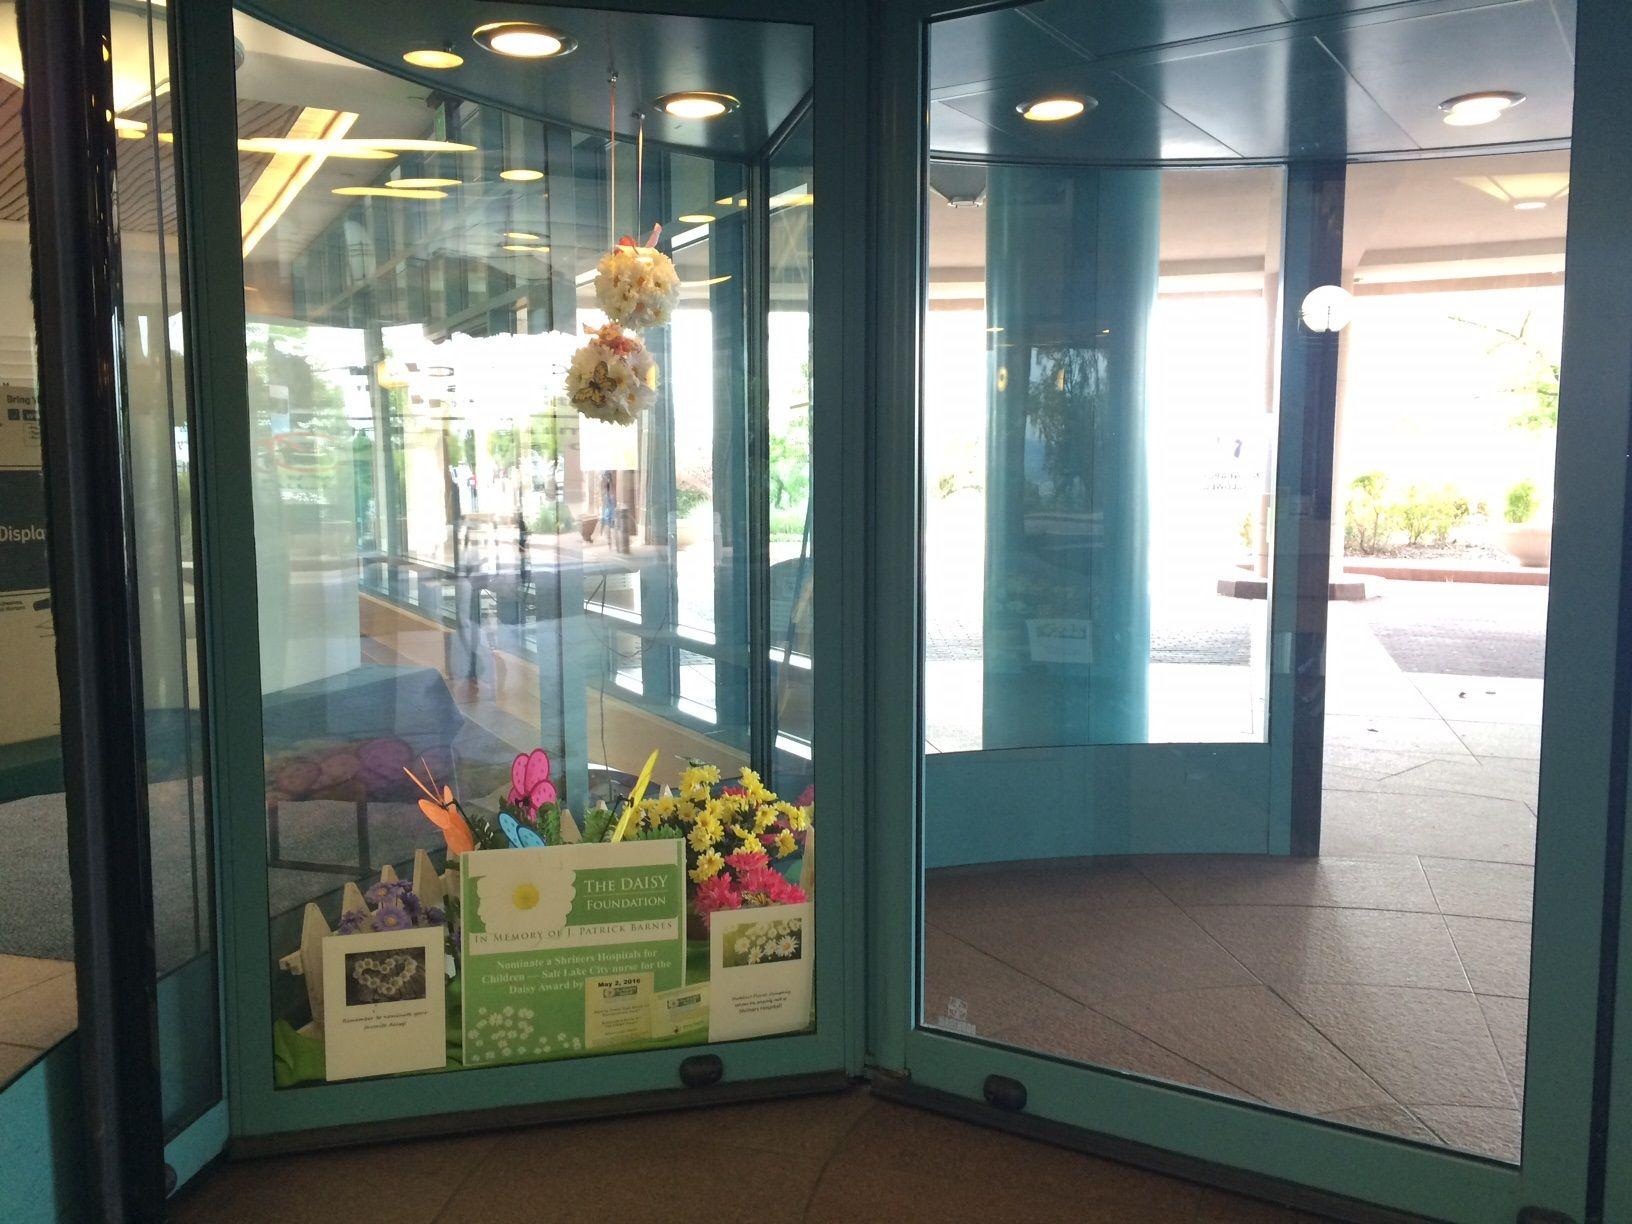 Great idea shriners hospitals for childrensalt lake city